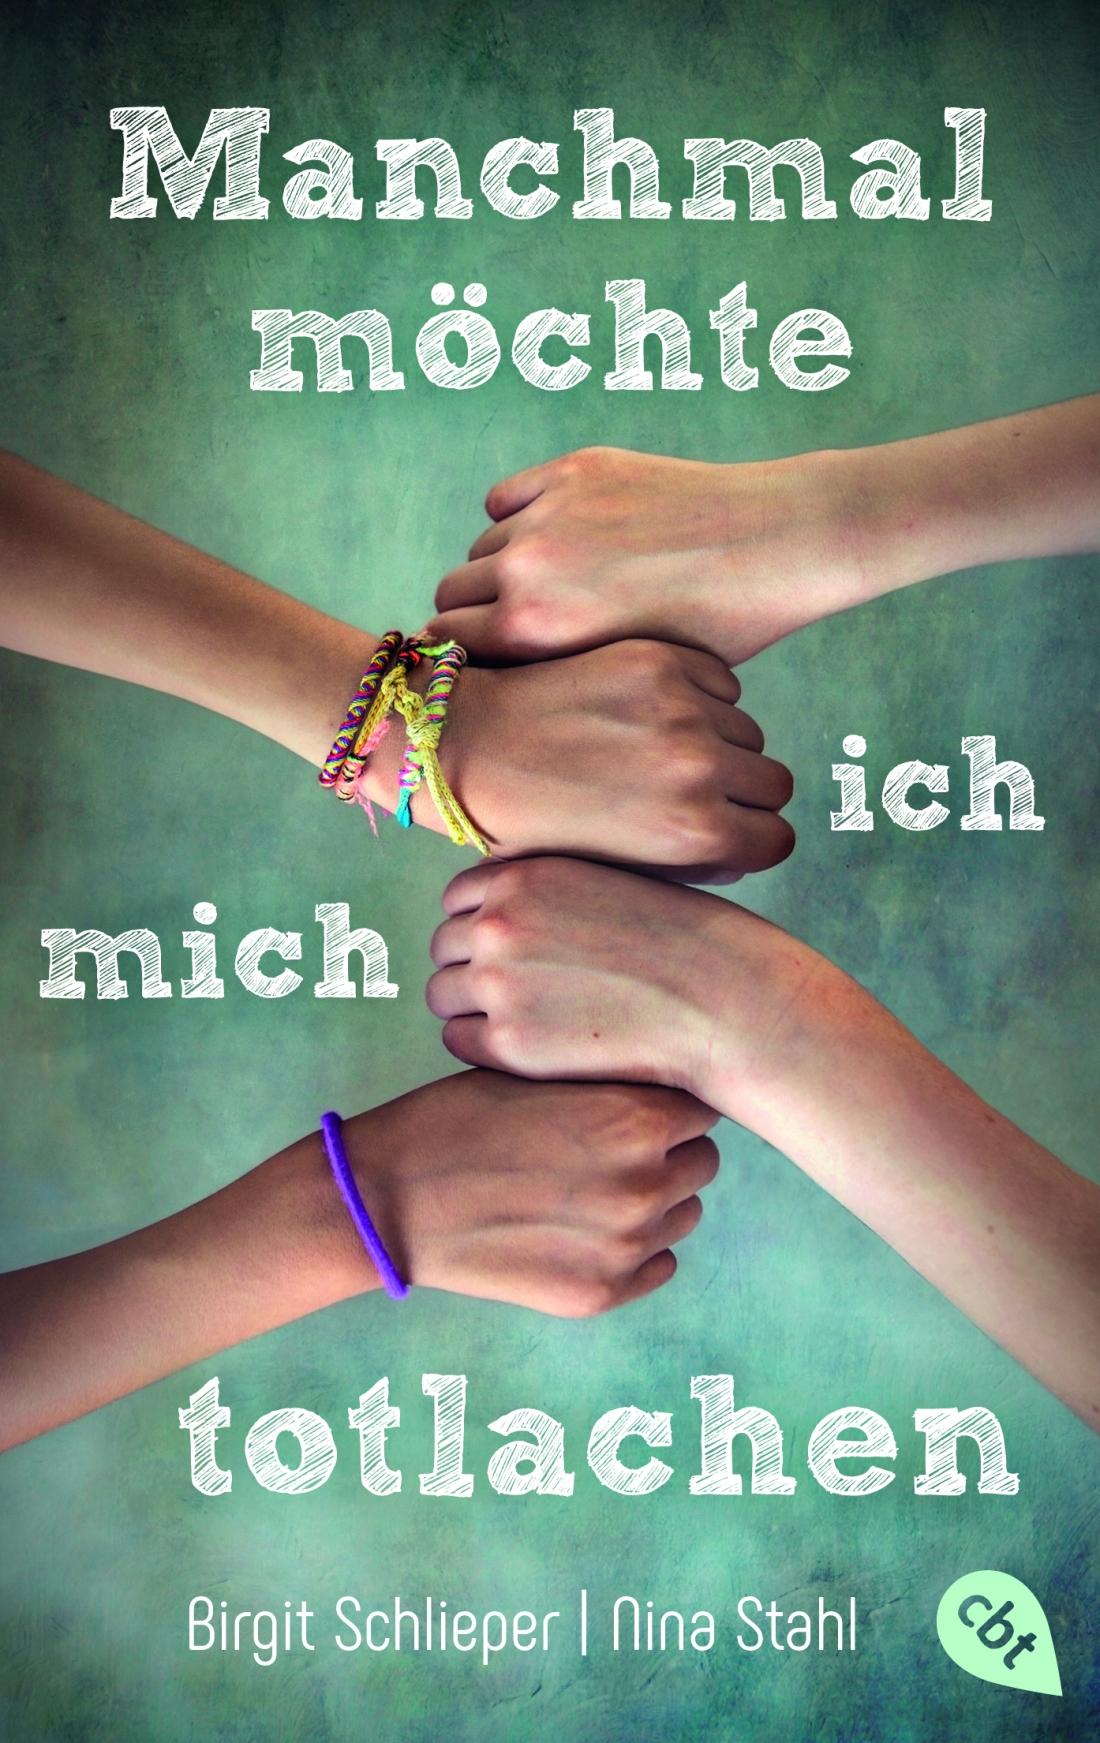 Schlieper_Totlachen_U1_FIN